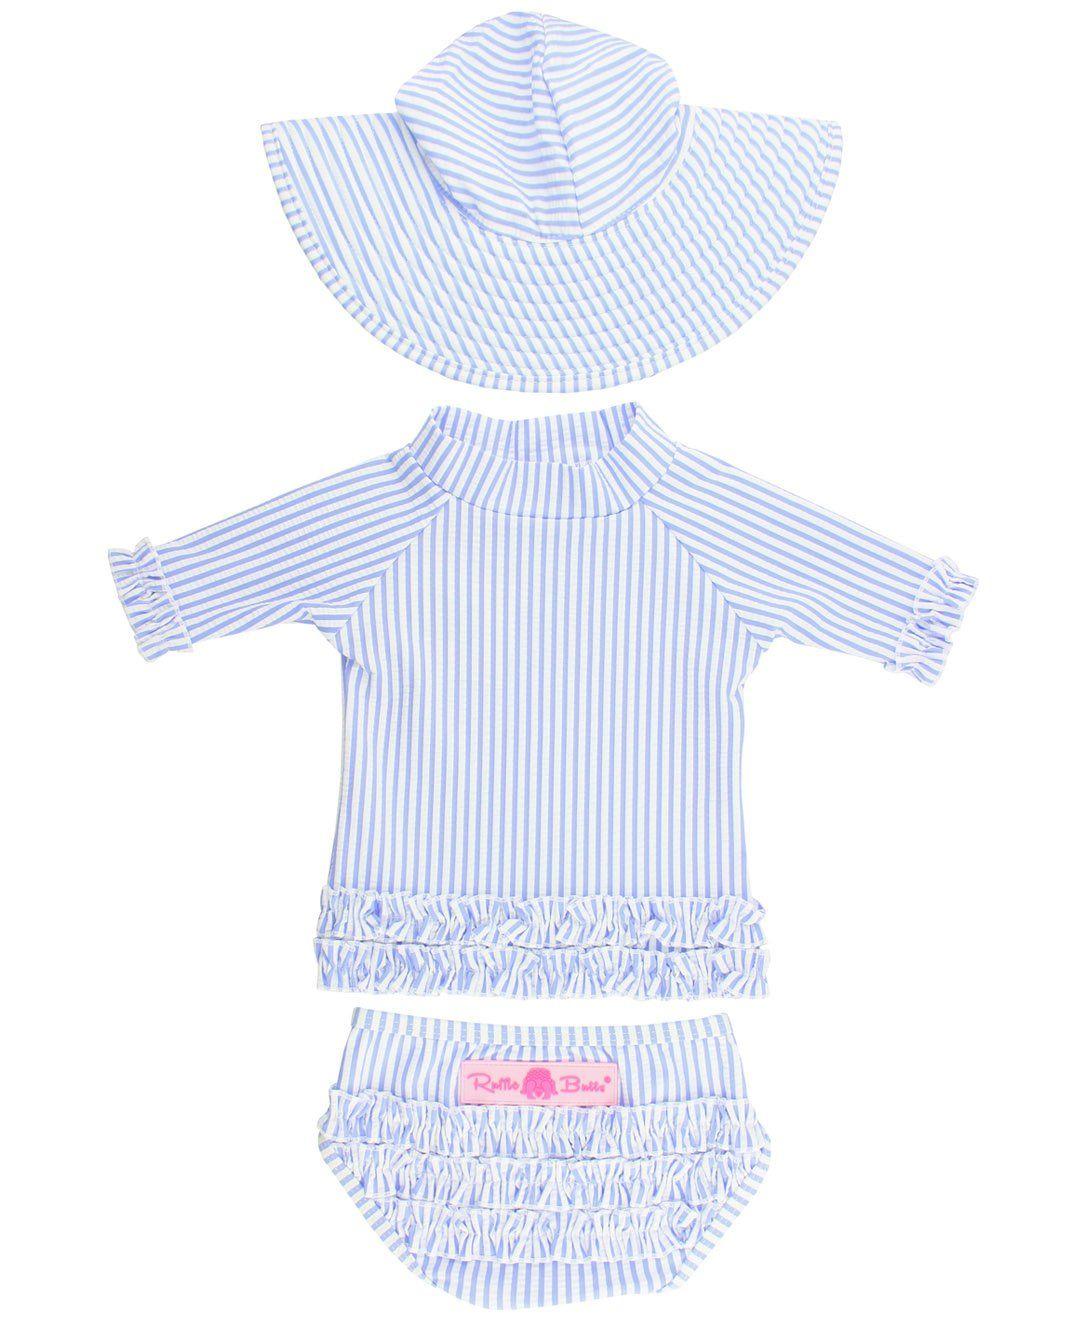 RuffleButts Girls Periwinkle Blue Seersucker Rash Guard   Swim Hat Set -  Periwinkle Blue Seersucker - bae2416b497e